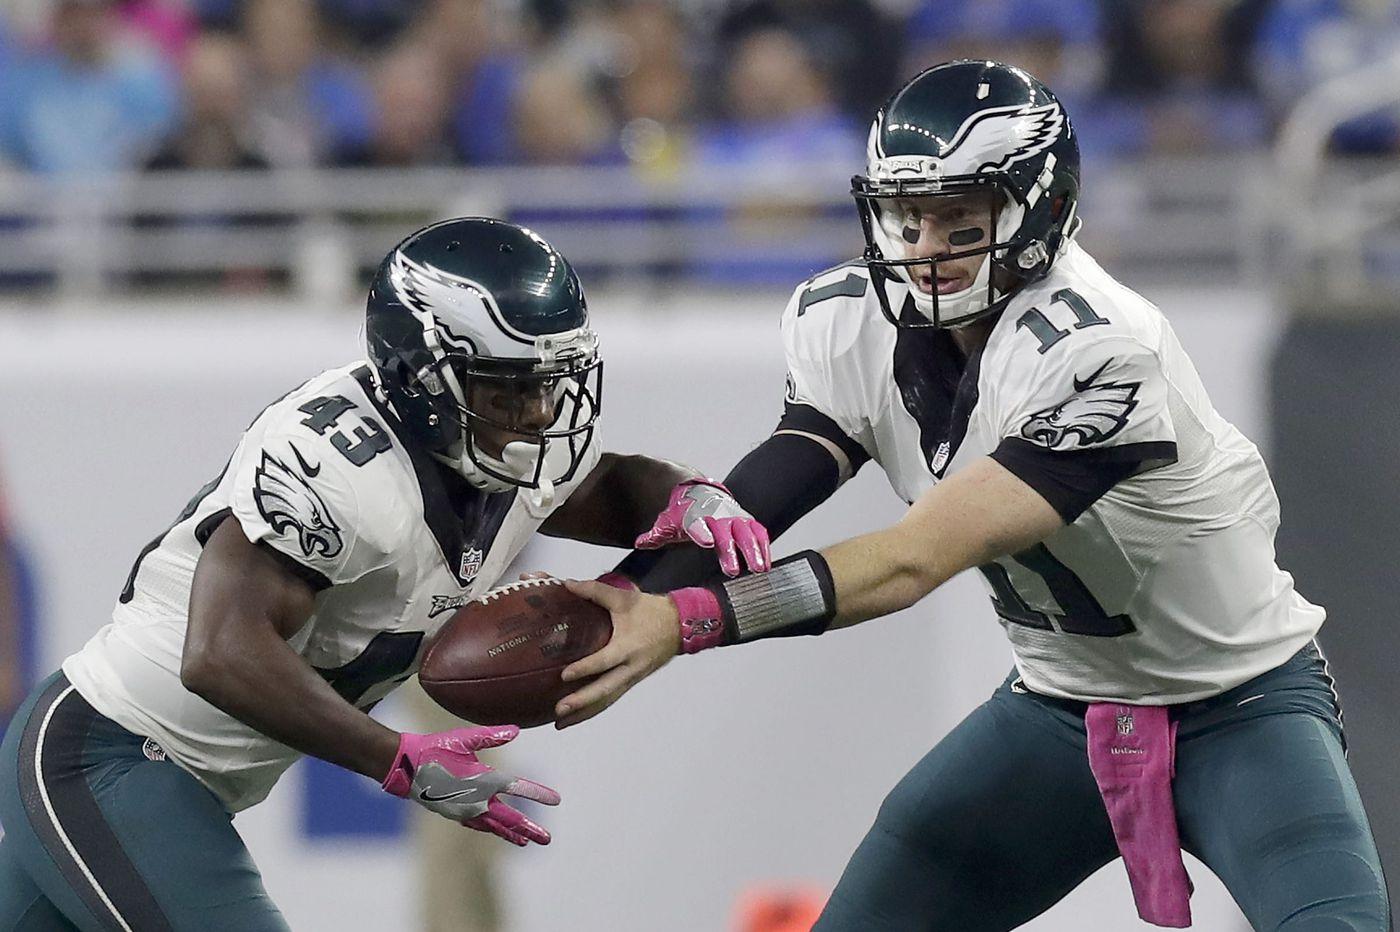 Eagles' Darren Sproles says 2018 season will be his last